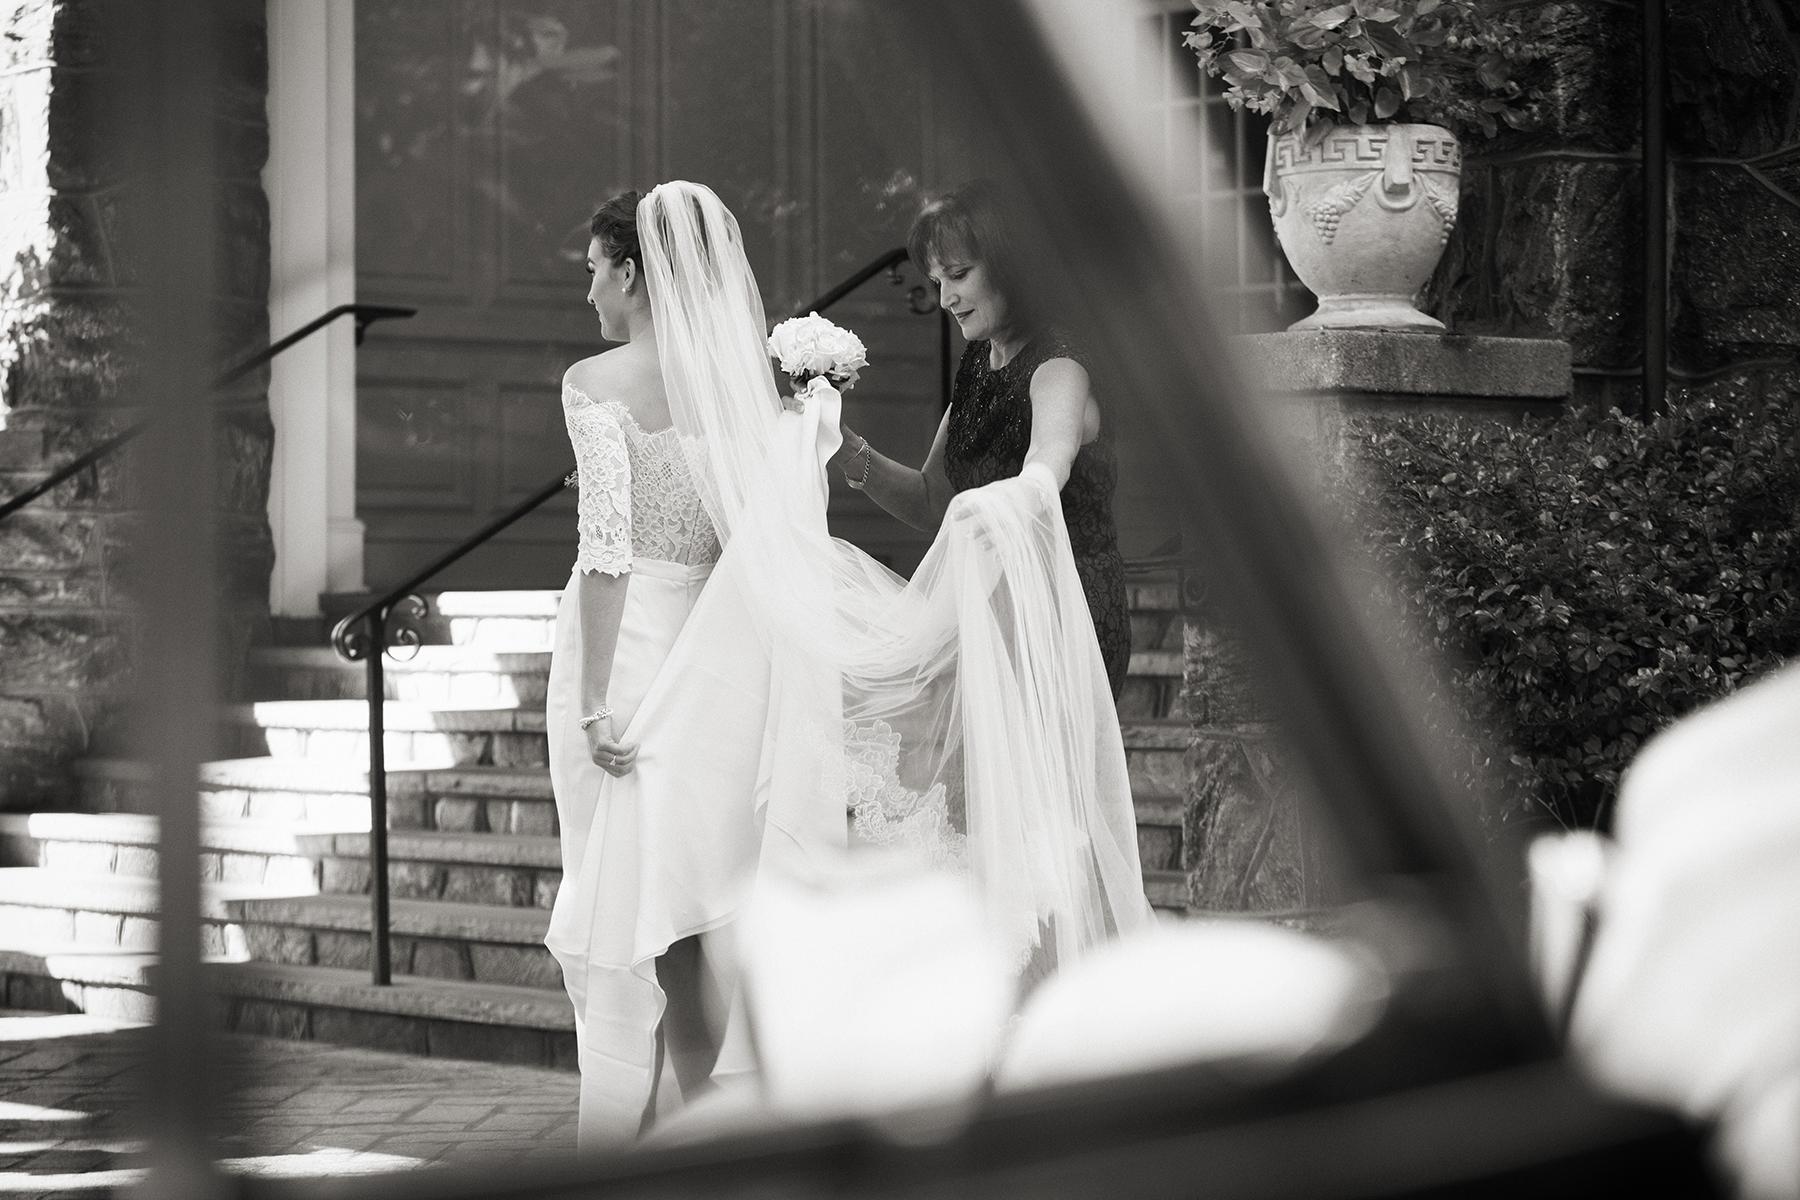 raquelreis_wedding_photography_apawamisclub_025.jpg